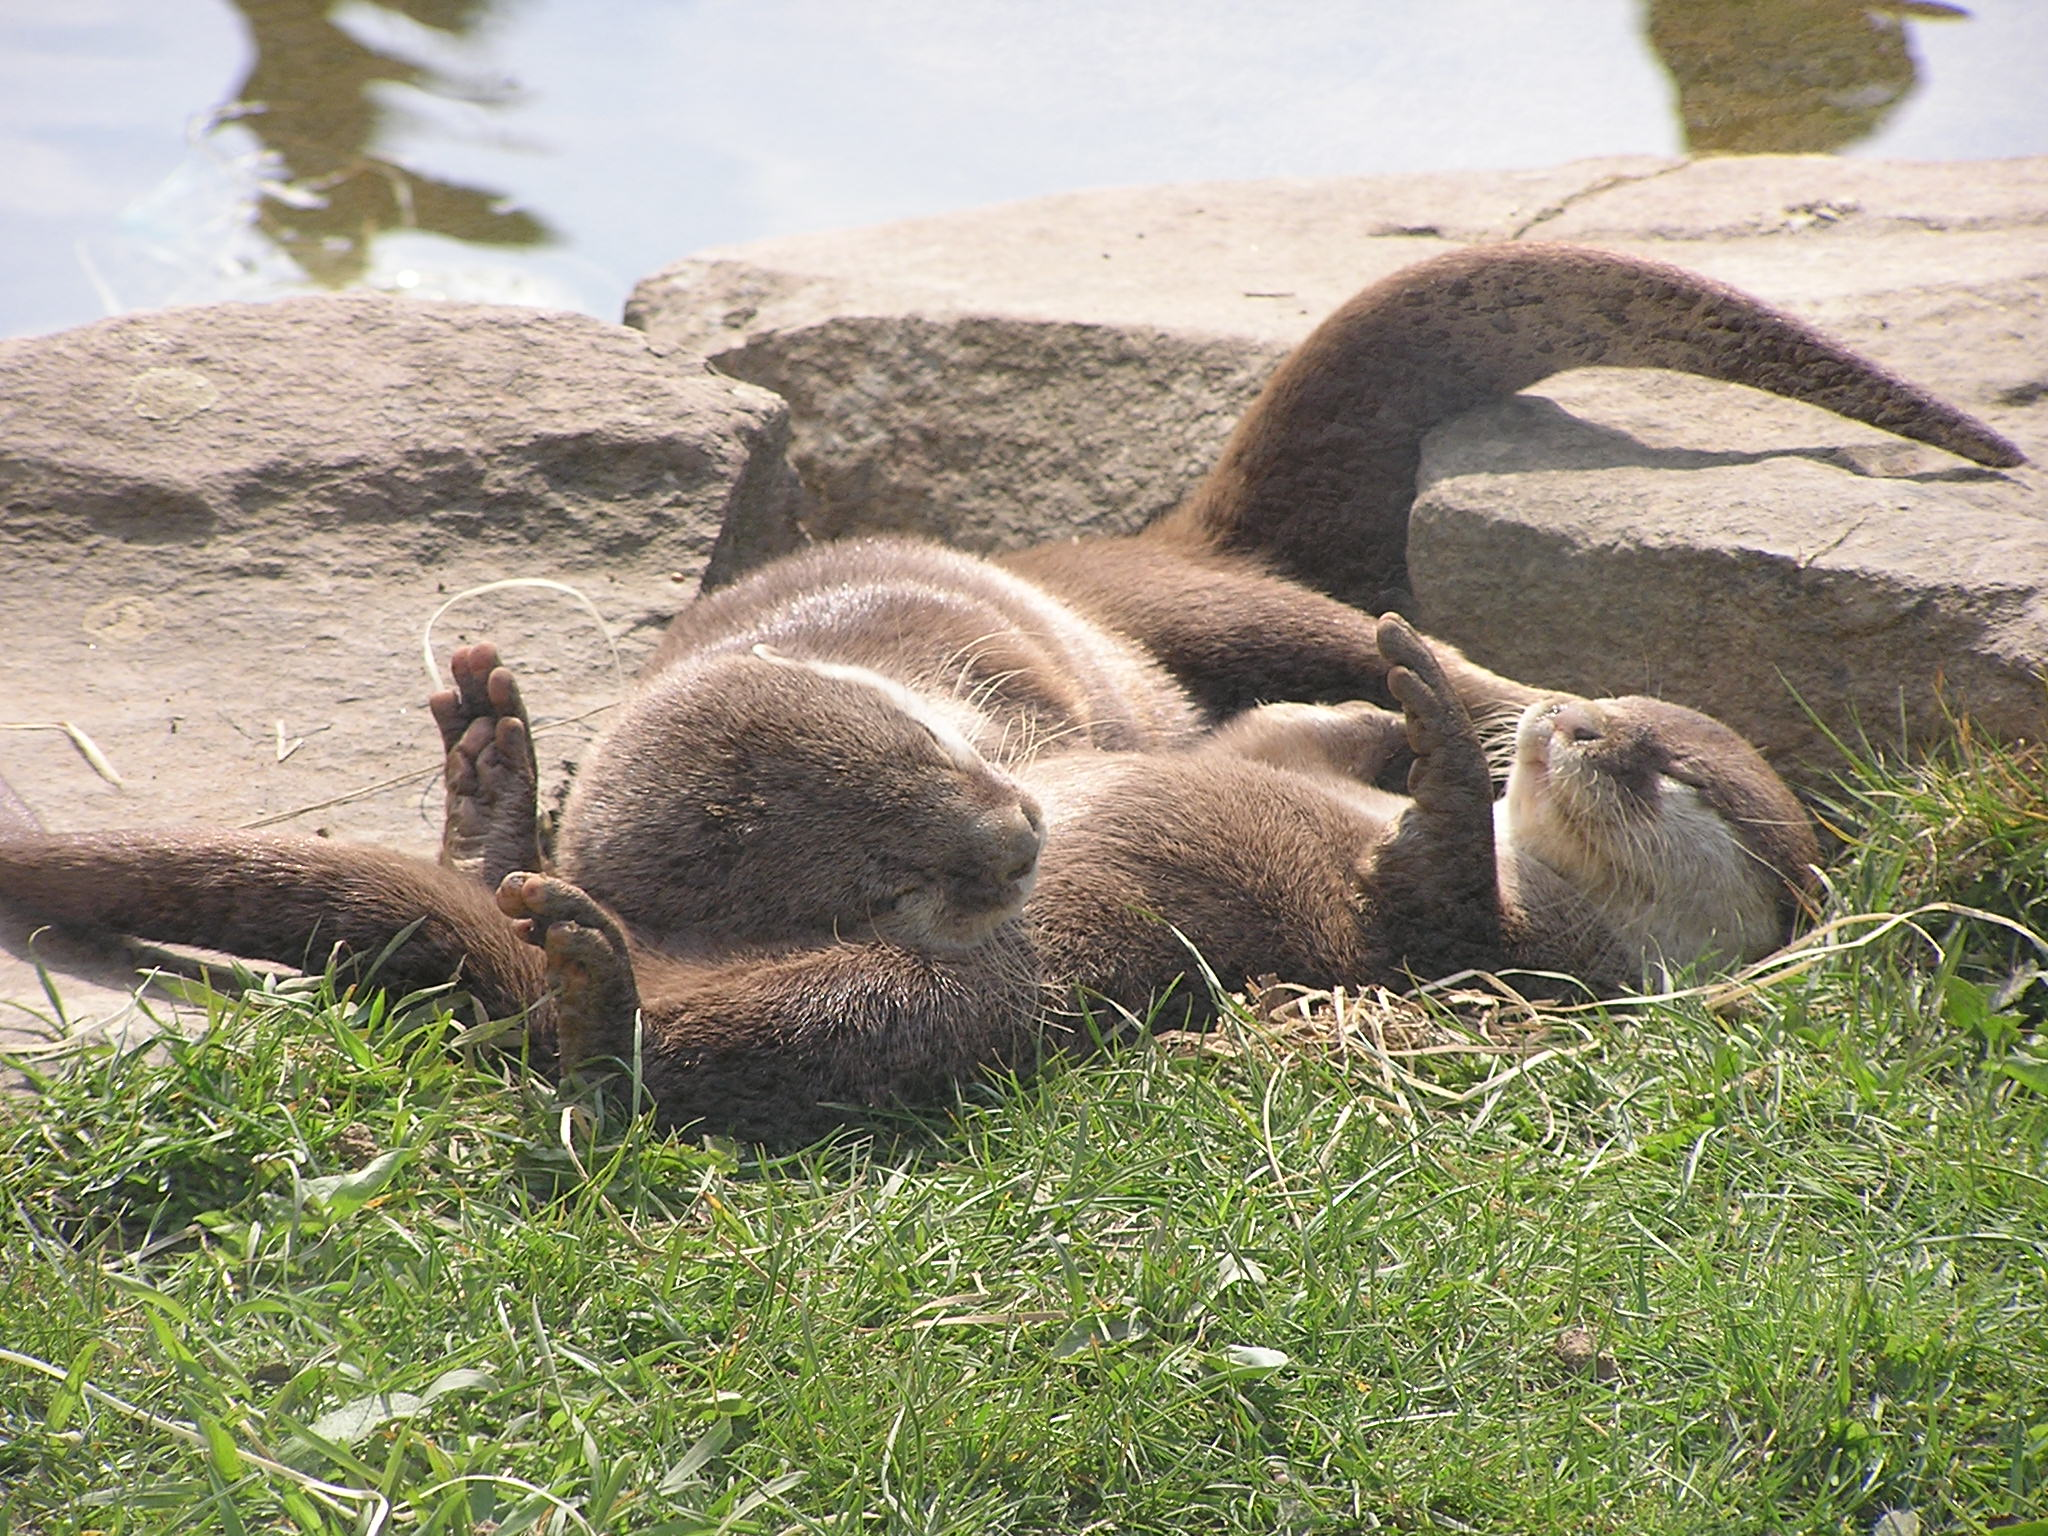 Otters Sunbathe and Nap